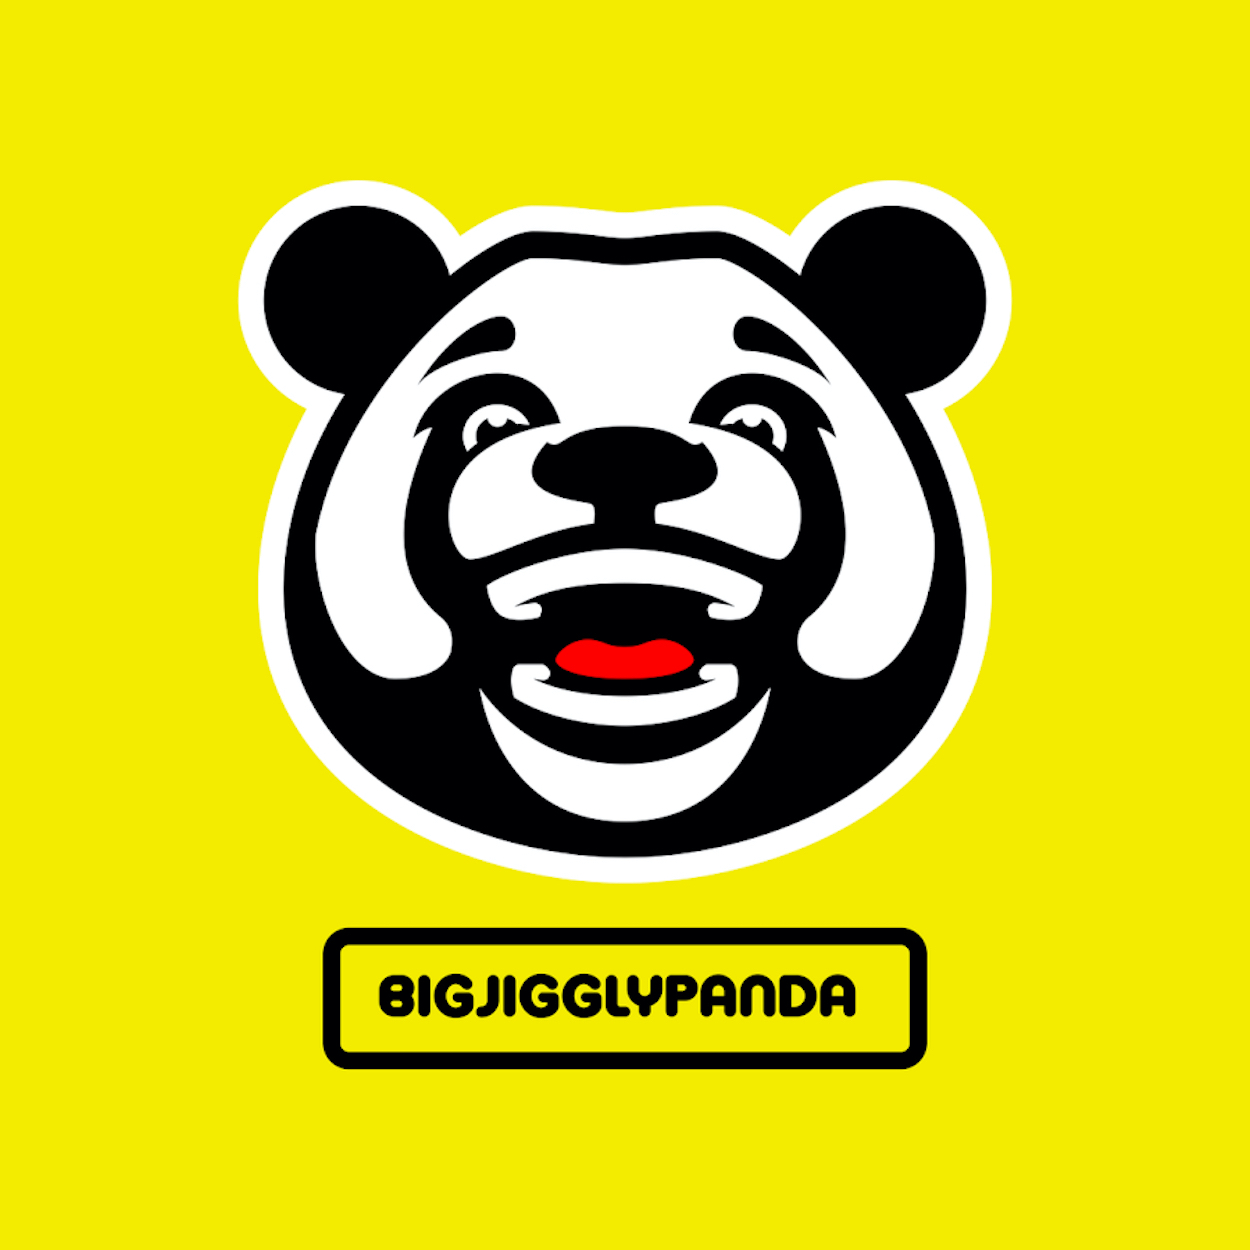 BigJigglyPanda | Vanoss And Friends Wiki | FANDOM powered by